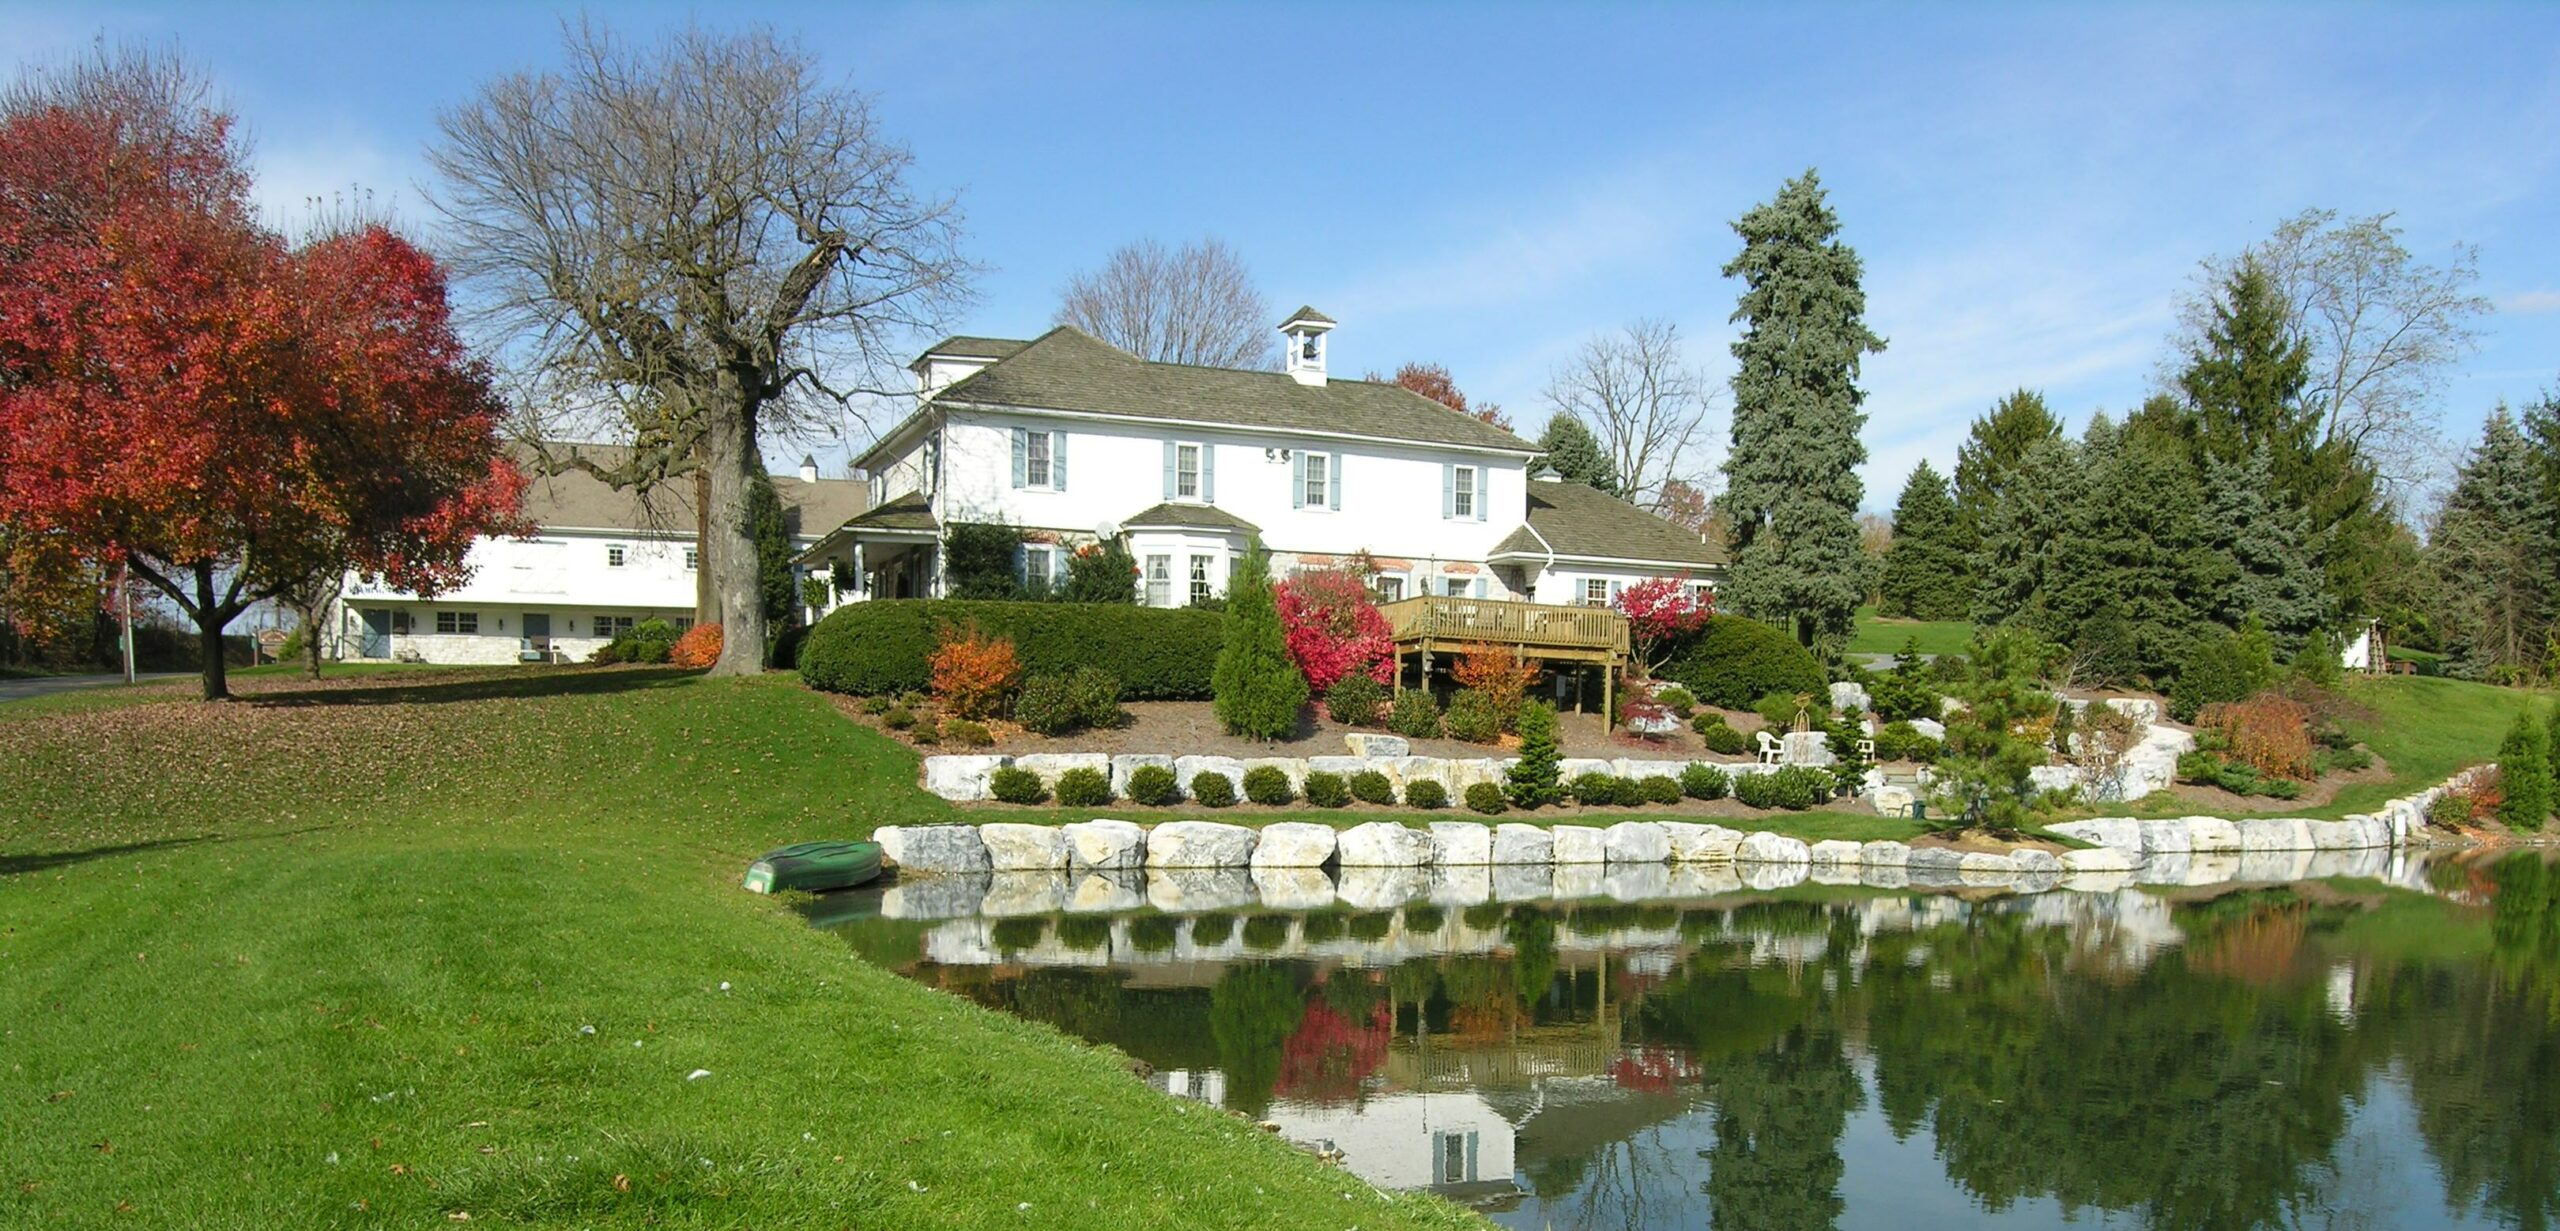 Farm pond bank-stabilization provides access terraces for grandparents to fish with grandchildren, Lititz, PA